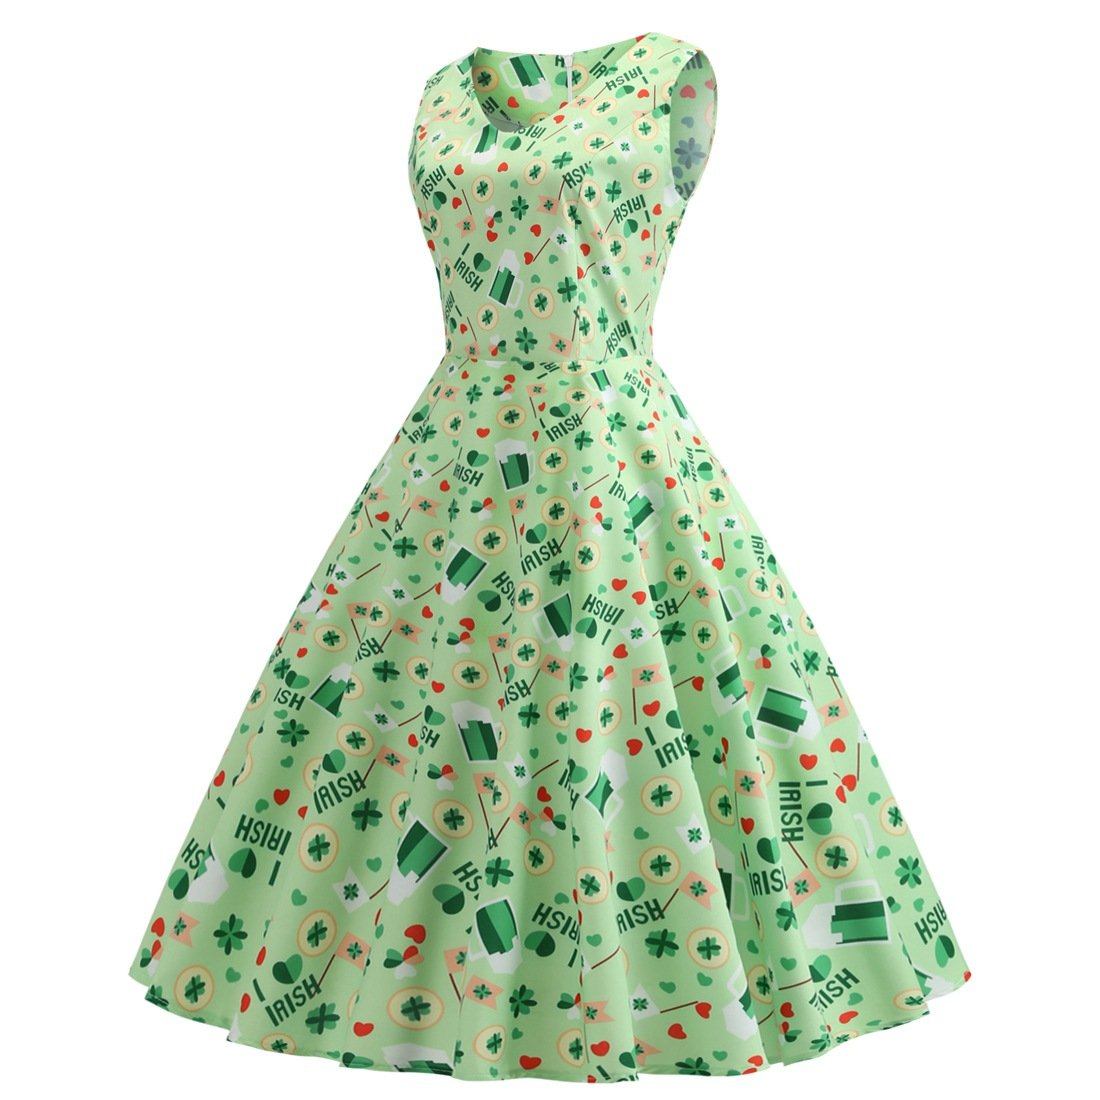 Ireland Shamrocks Printed Plus Size Vintage Midi Dresses St. Patrick's Day Retro Party Dresses